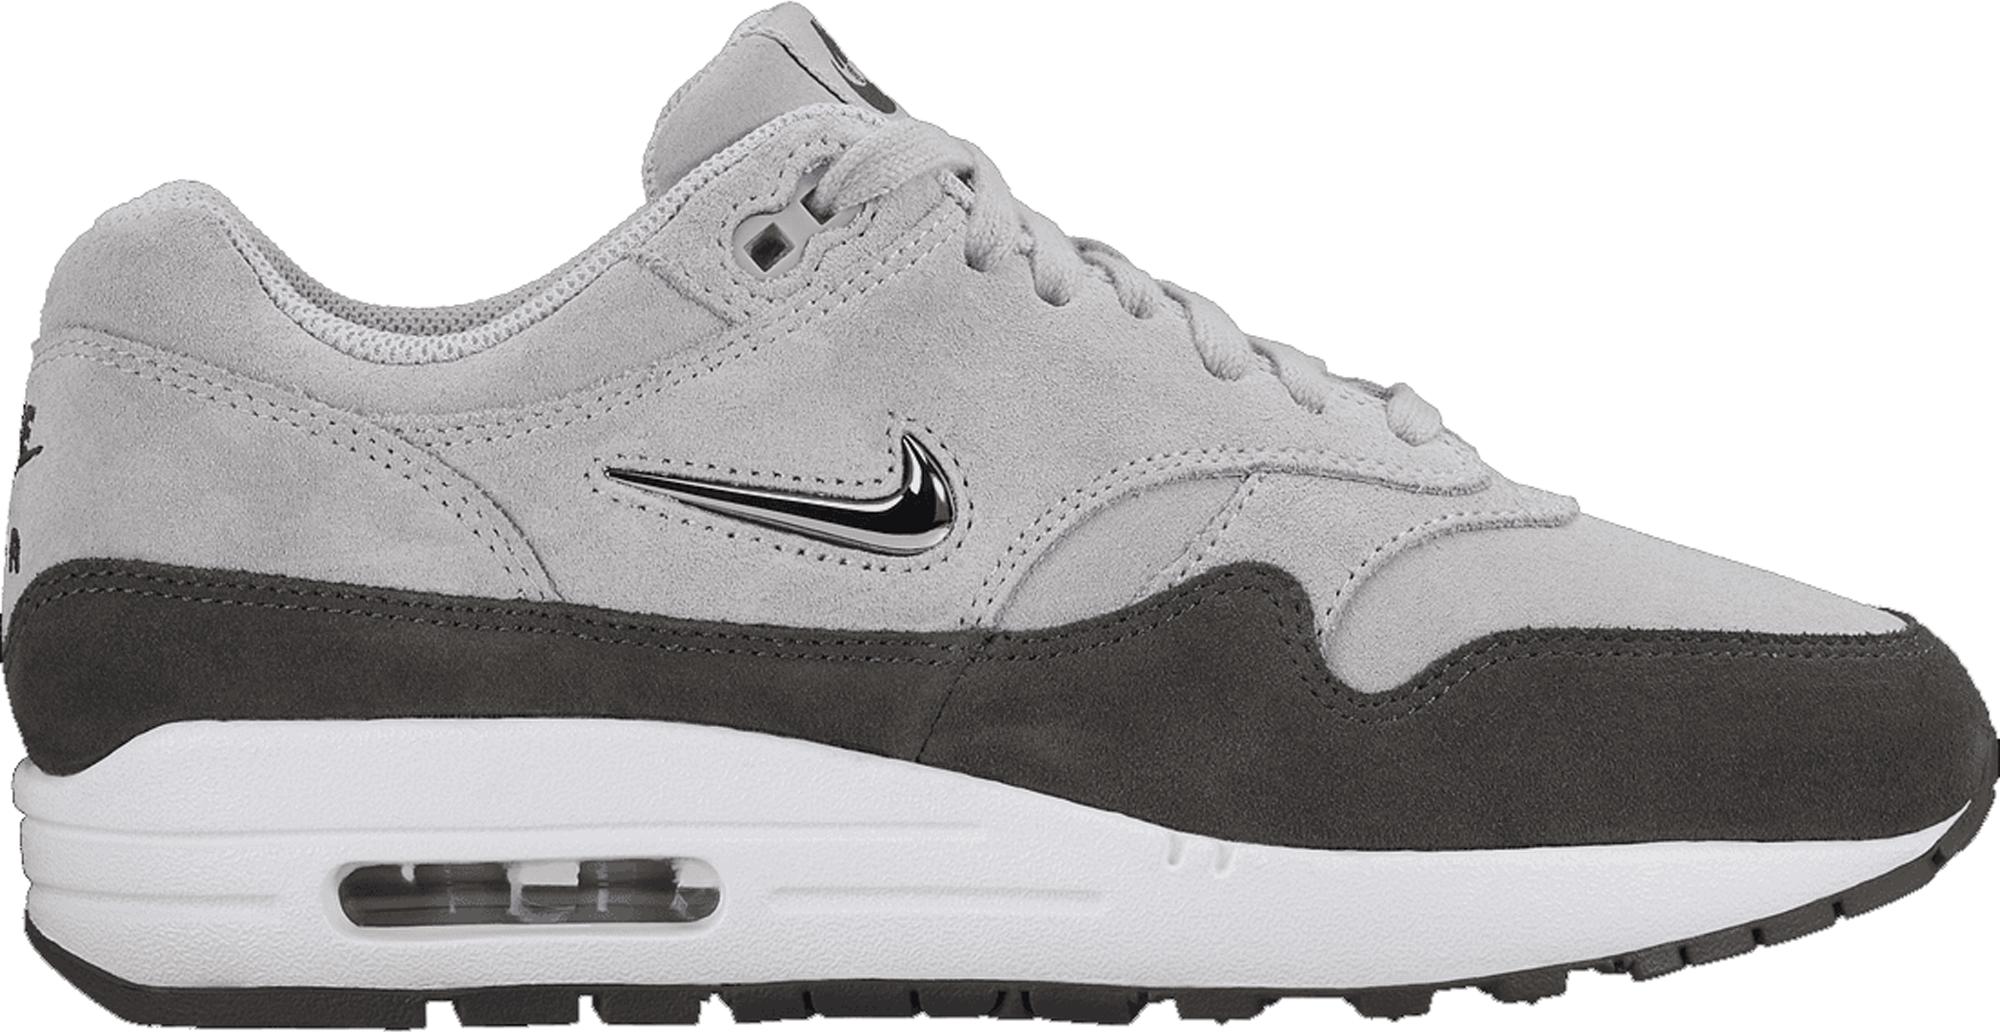 Nike Air Max 1 Jewel Wolf Grey (W